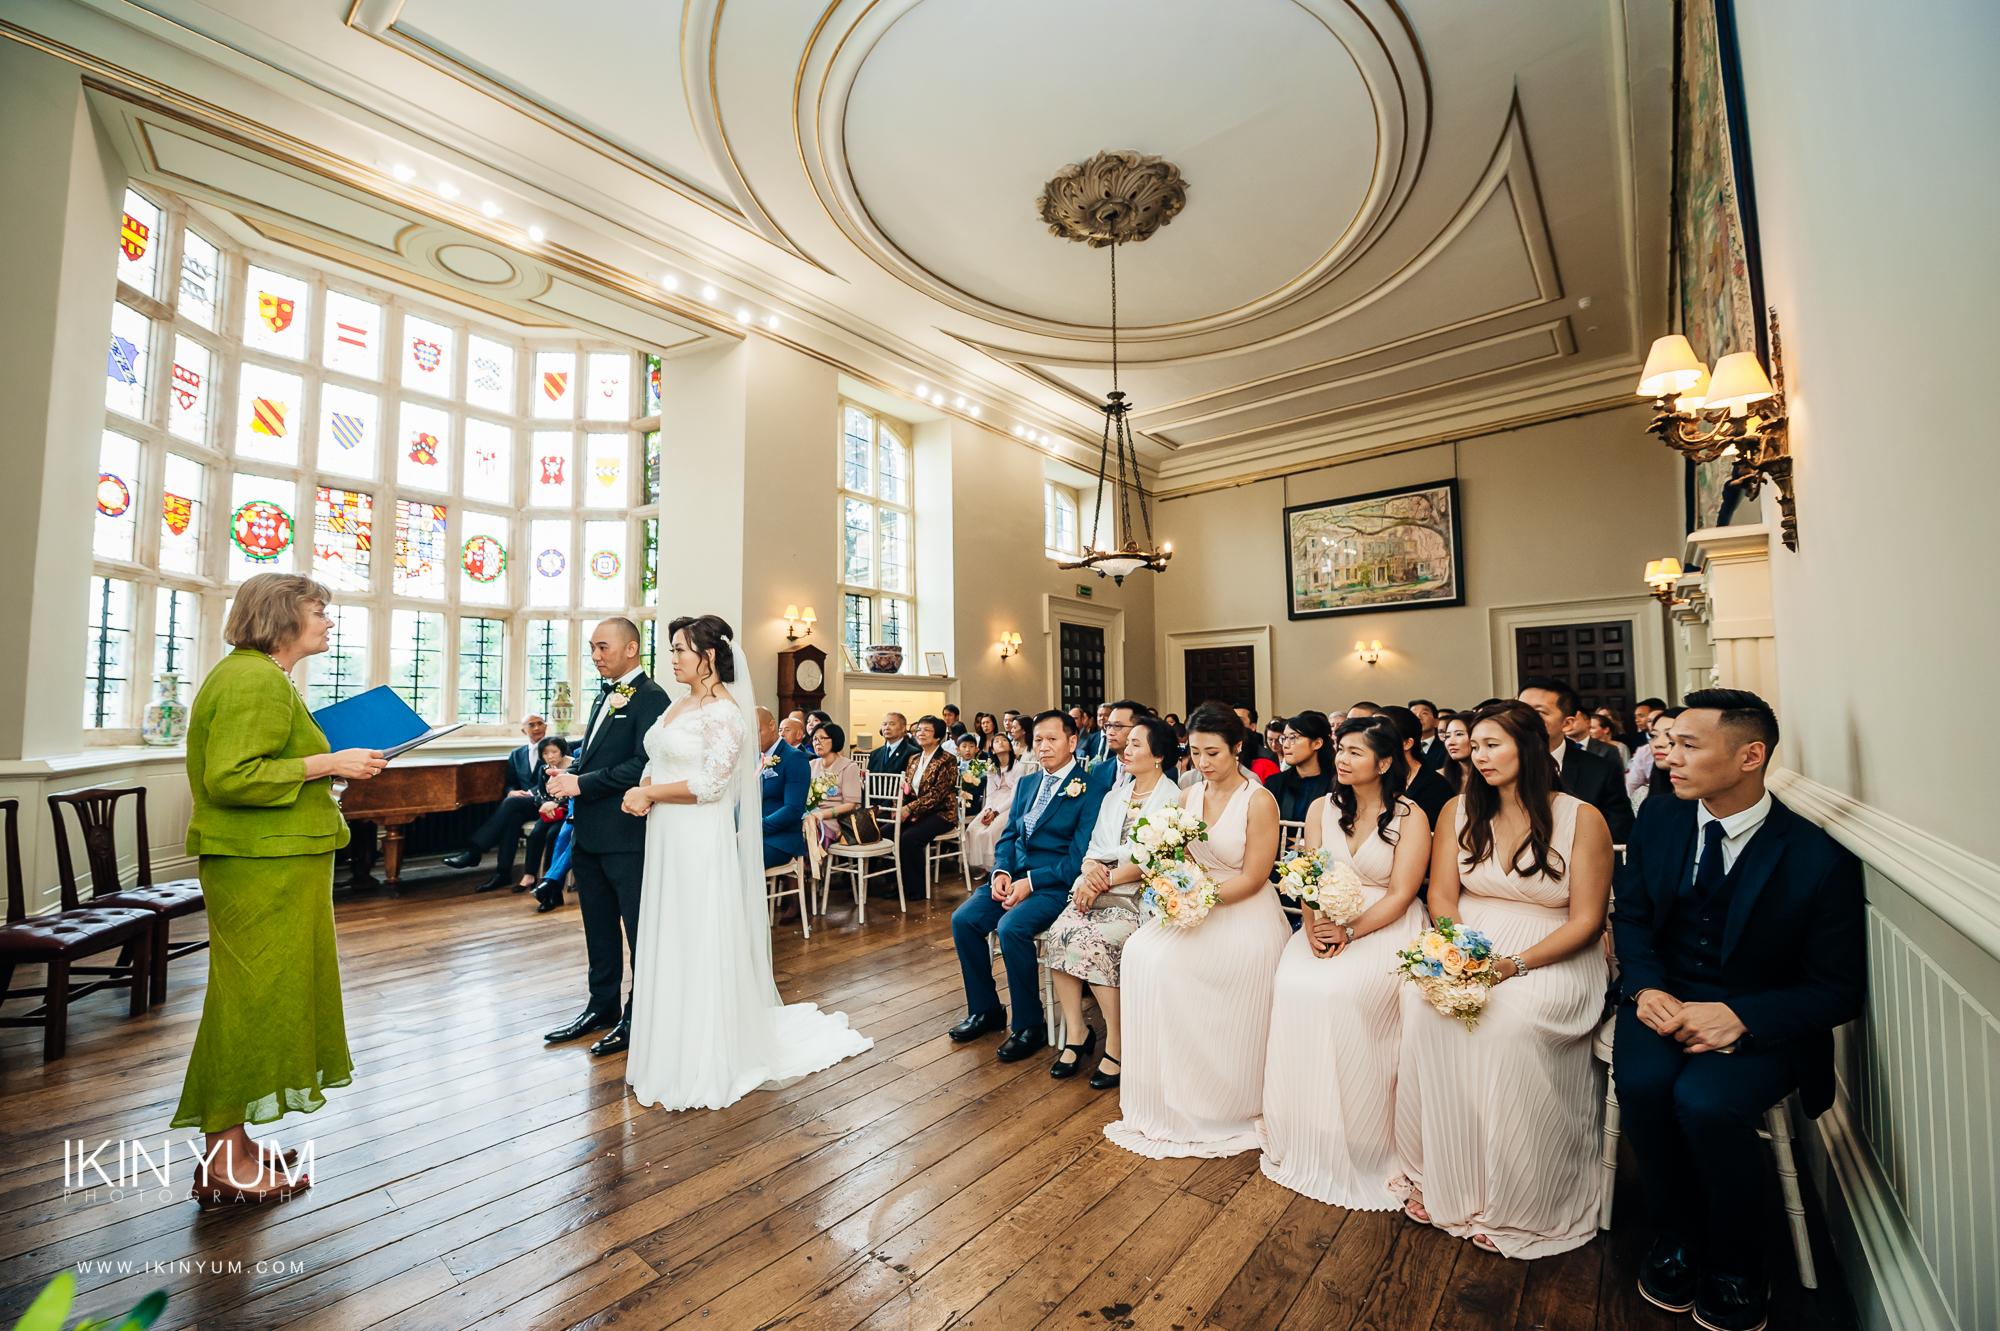 Elmore Court Wedding- Ikin Yum Photography-0055.jpg